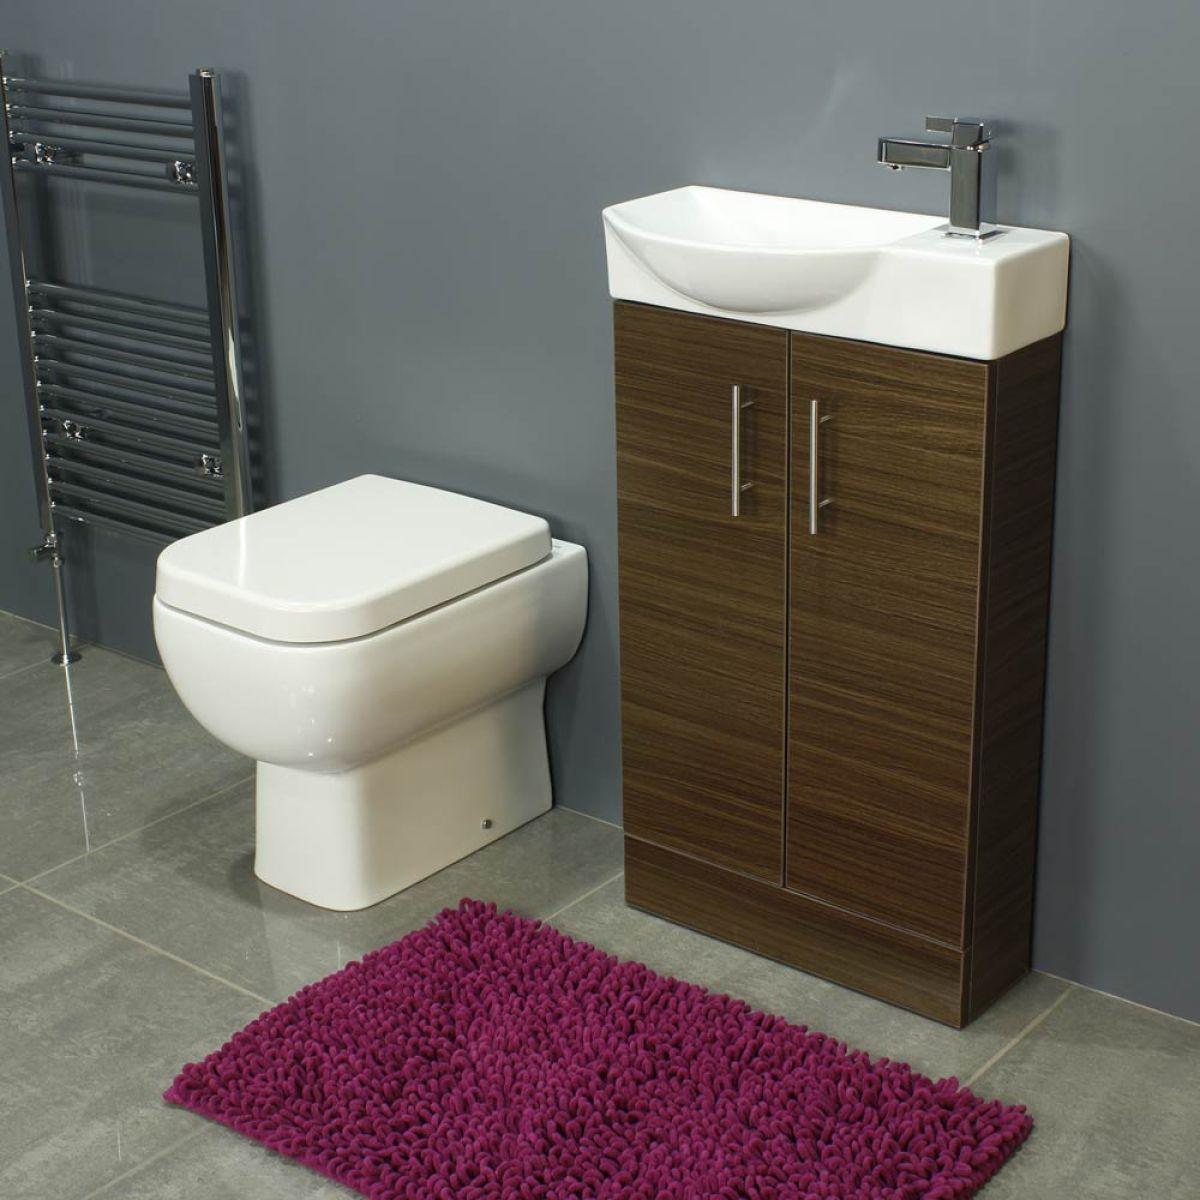 RAK Series 600 Back To Wall Toilet and 500 Series Walnut Mini Double Door Vanity Unit